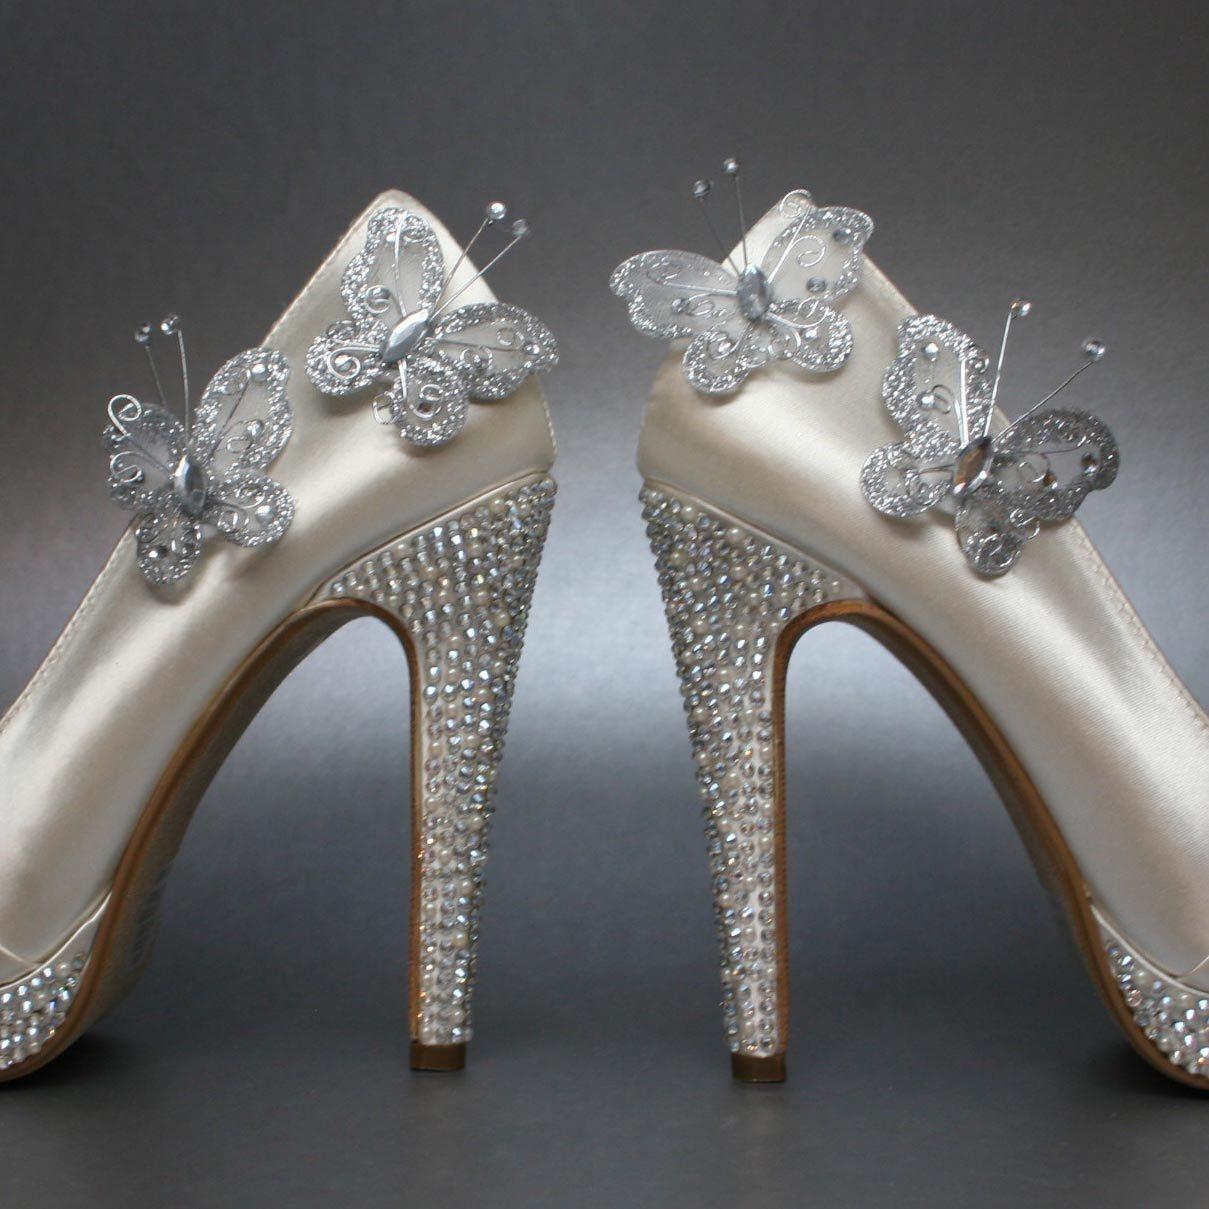 Wedding Shoes    Ivory Wedding Butterfly Platform Peeptoes With Rhinestones  On Platform And Heel.